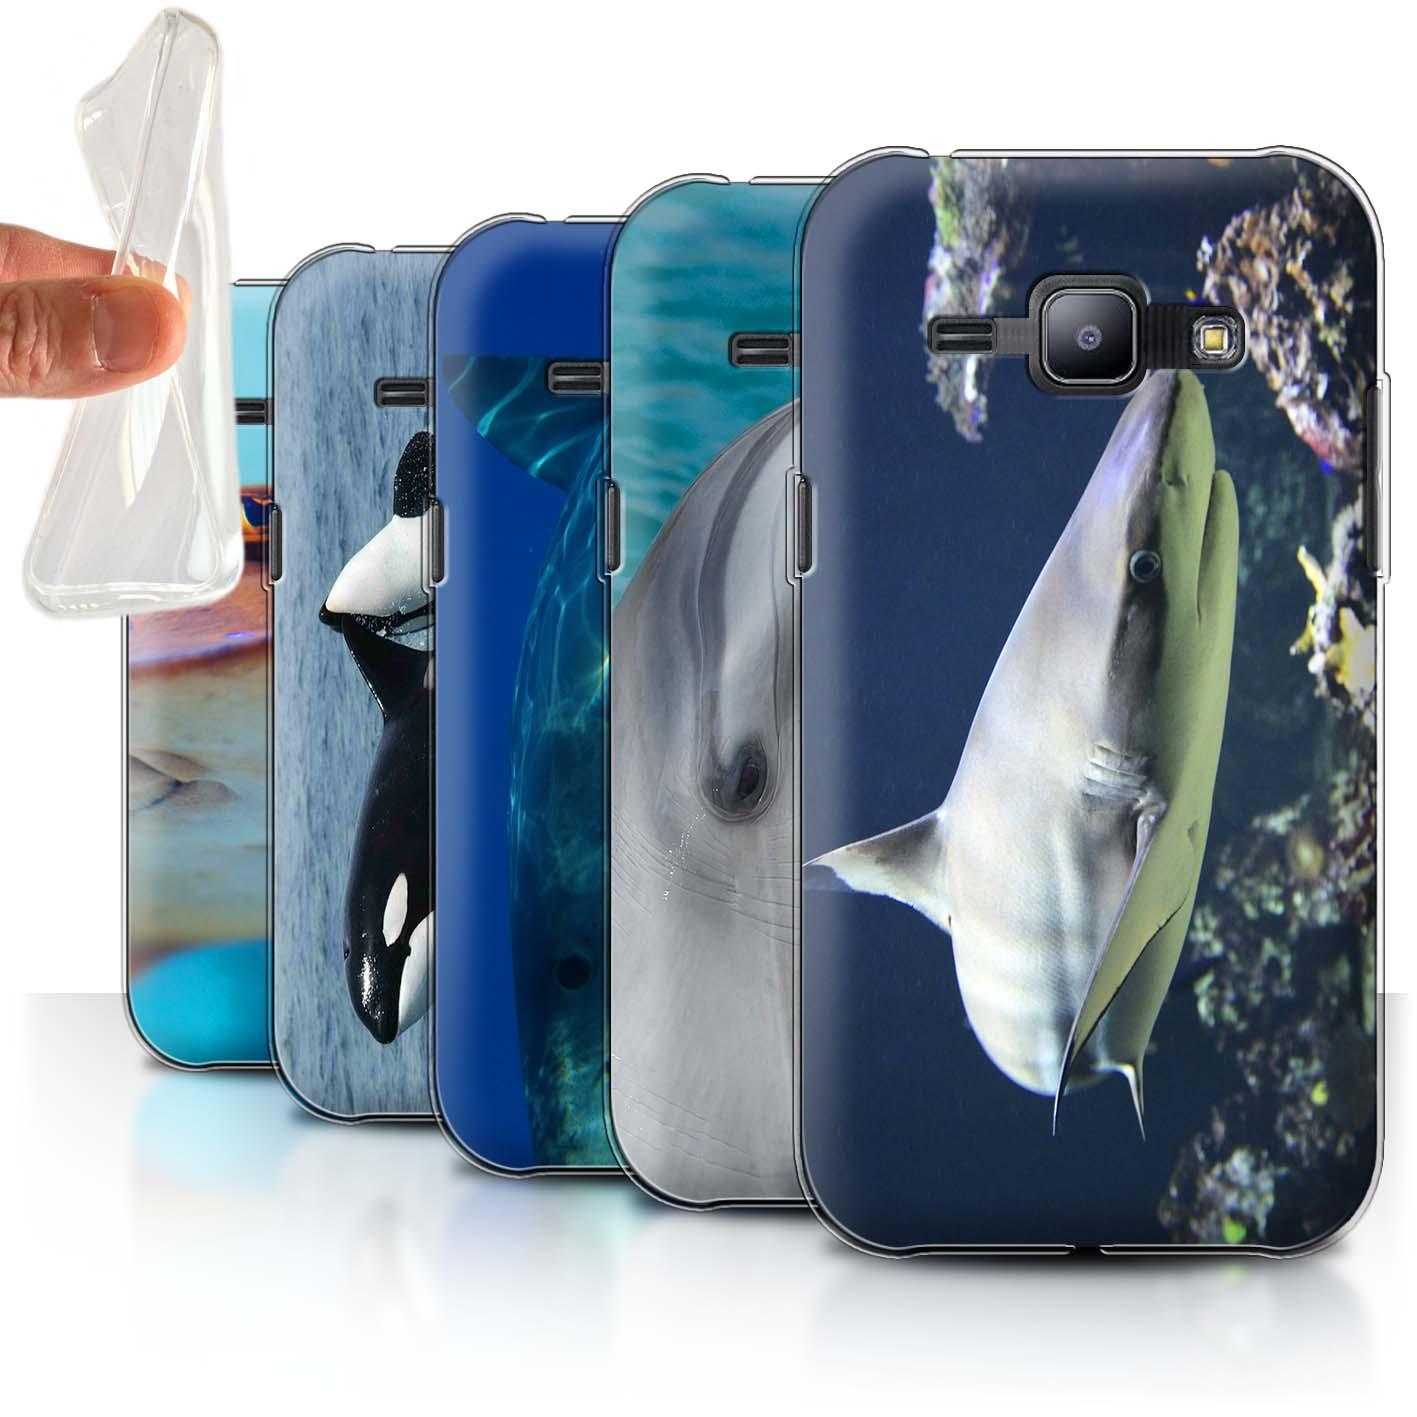 Gel-TPU-Coque-Etui-de-Stuff4-pour-Samsung-Galaxy-J1-J100-Faune-Marine